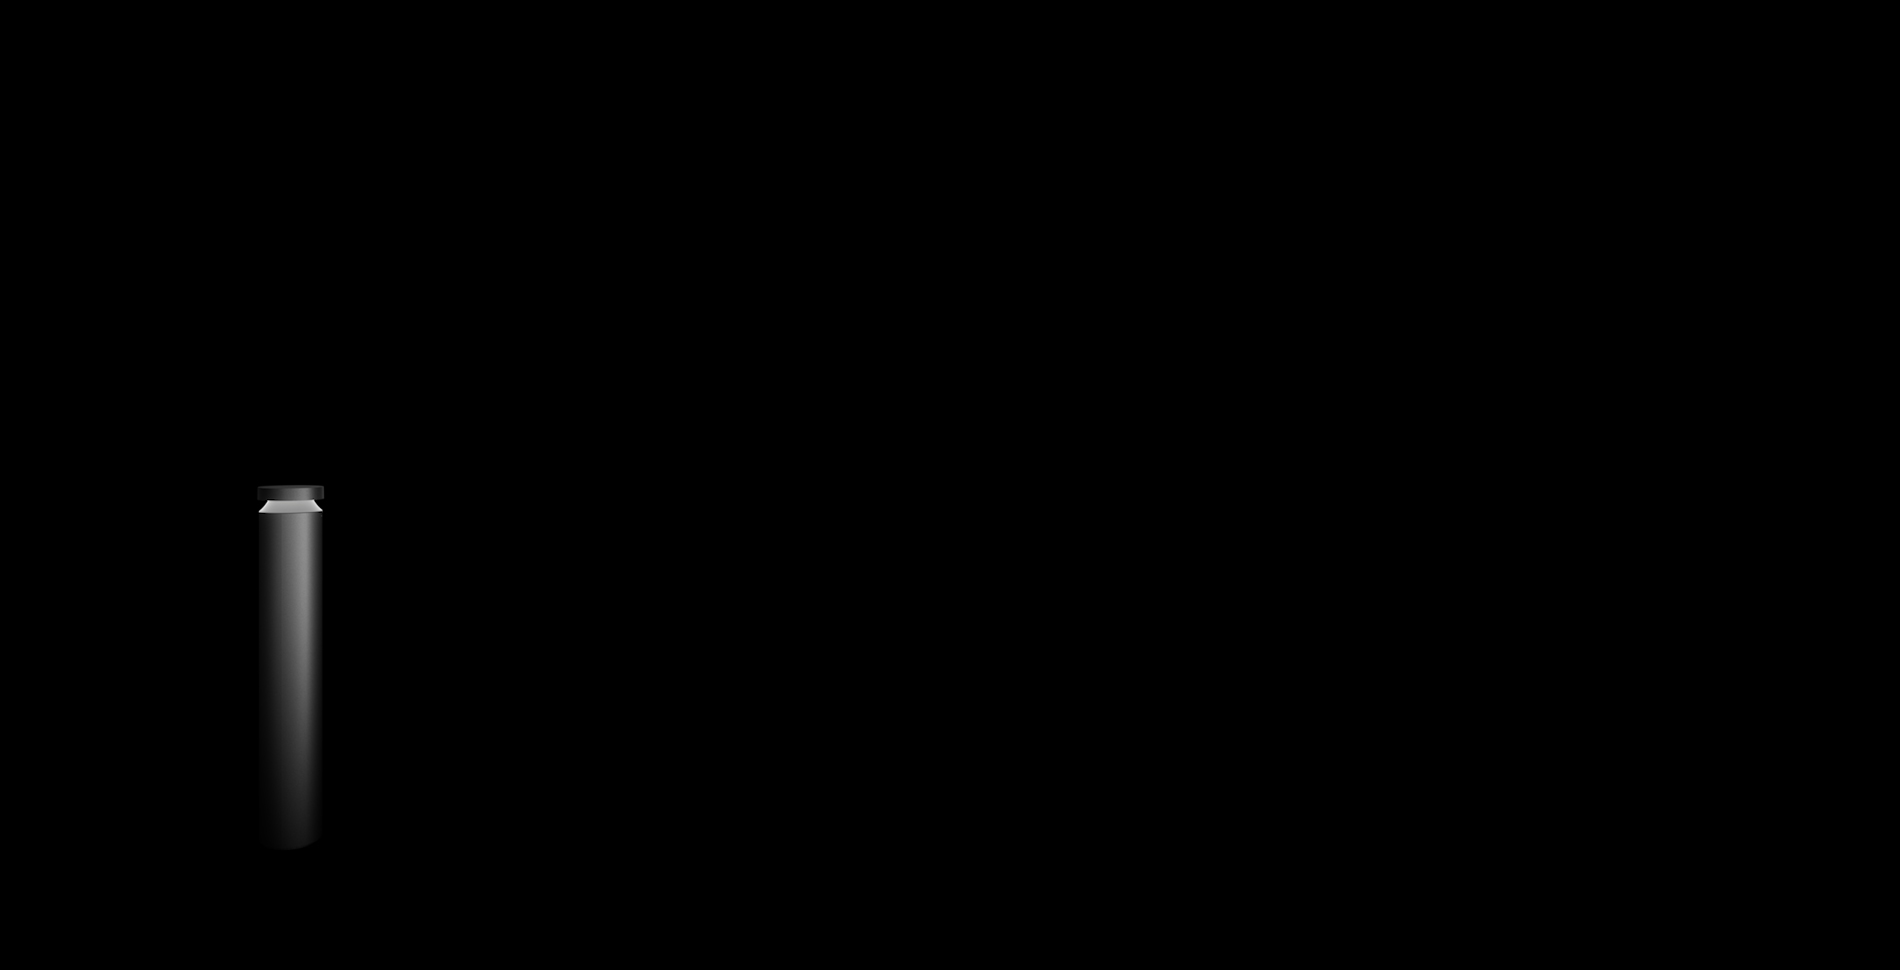 Sequenza-0229